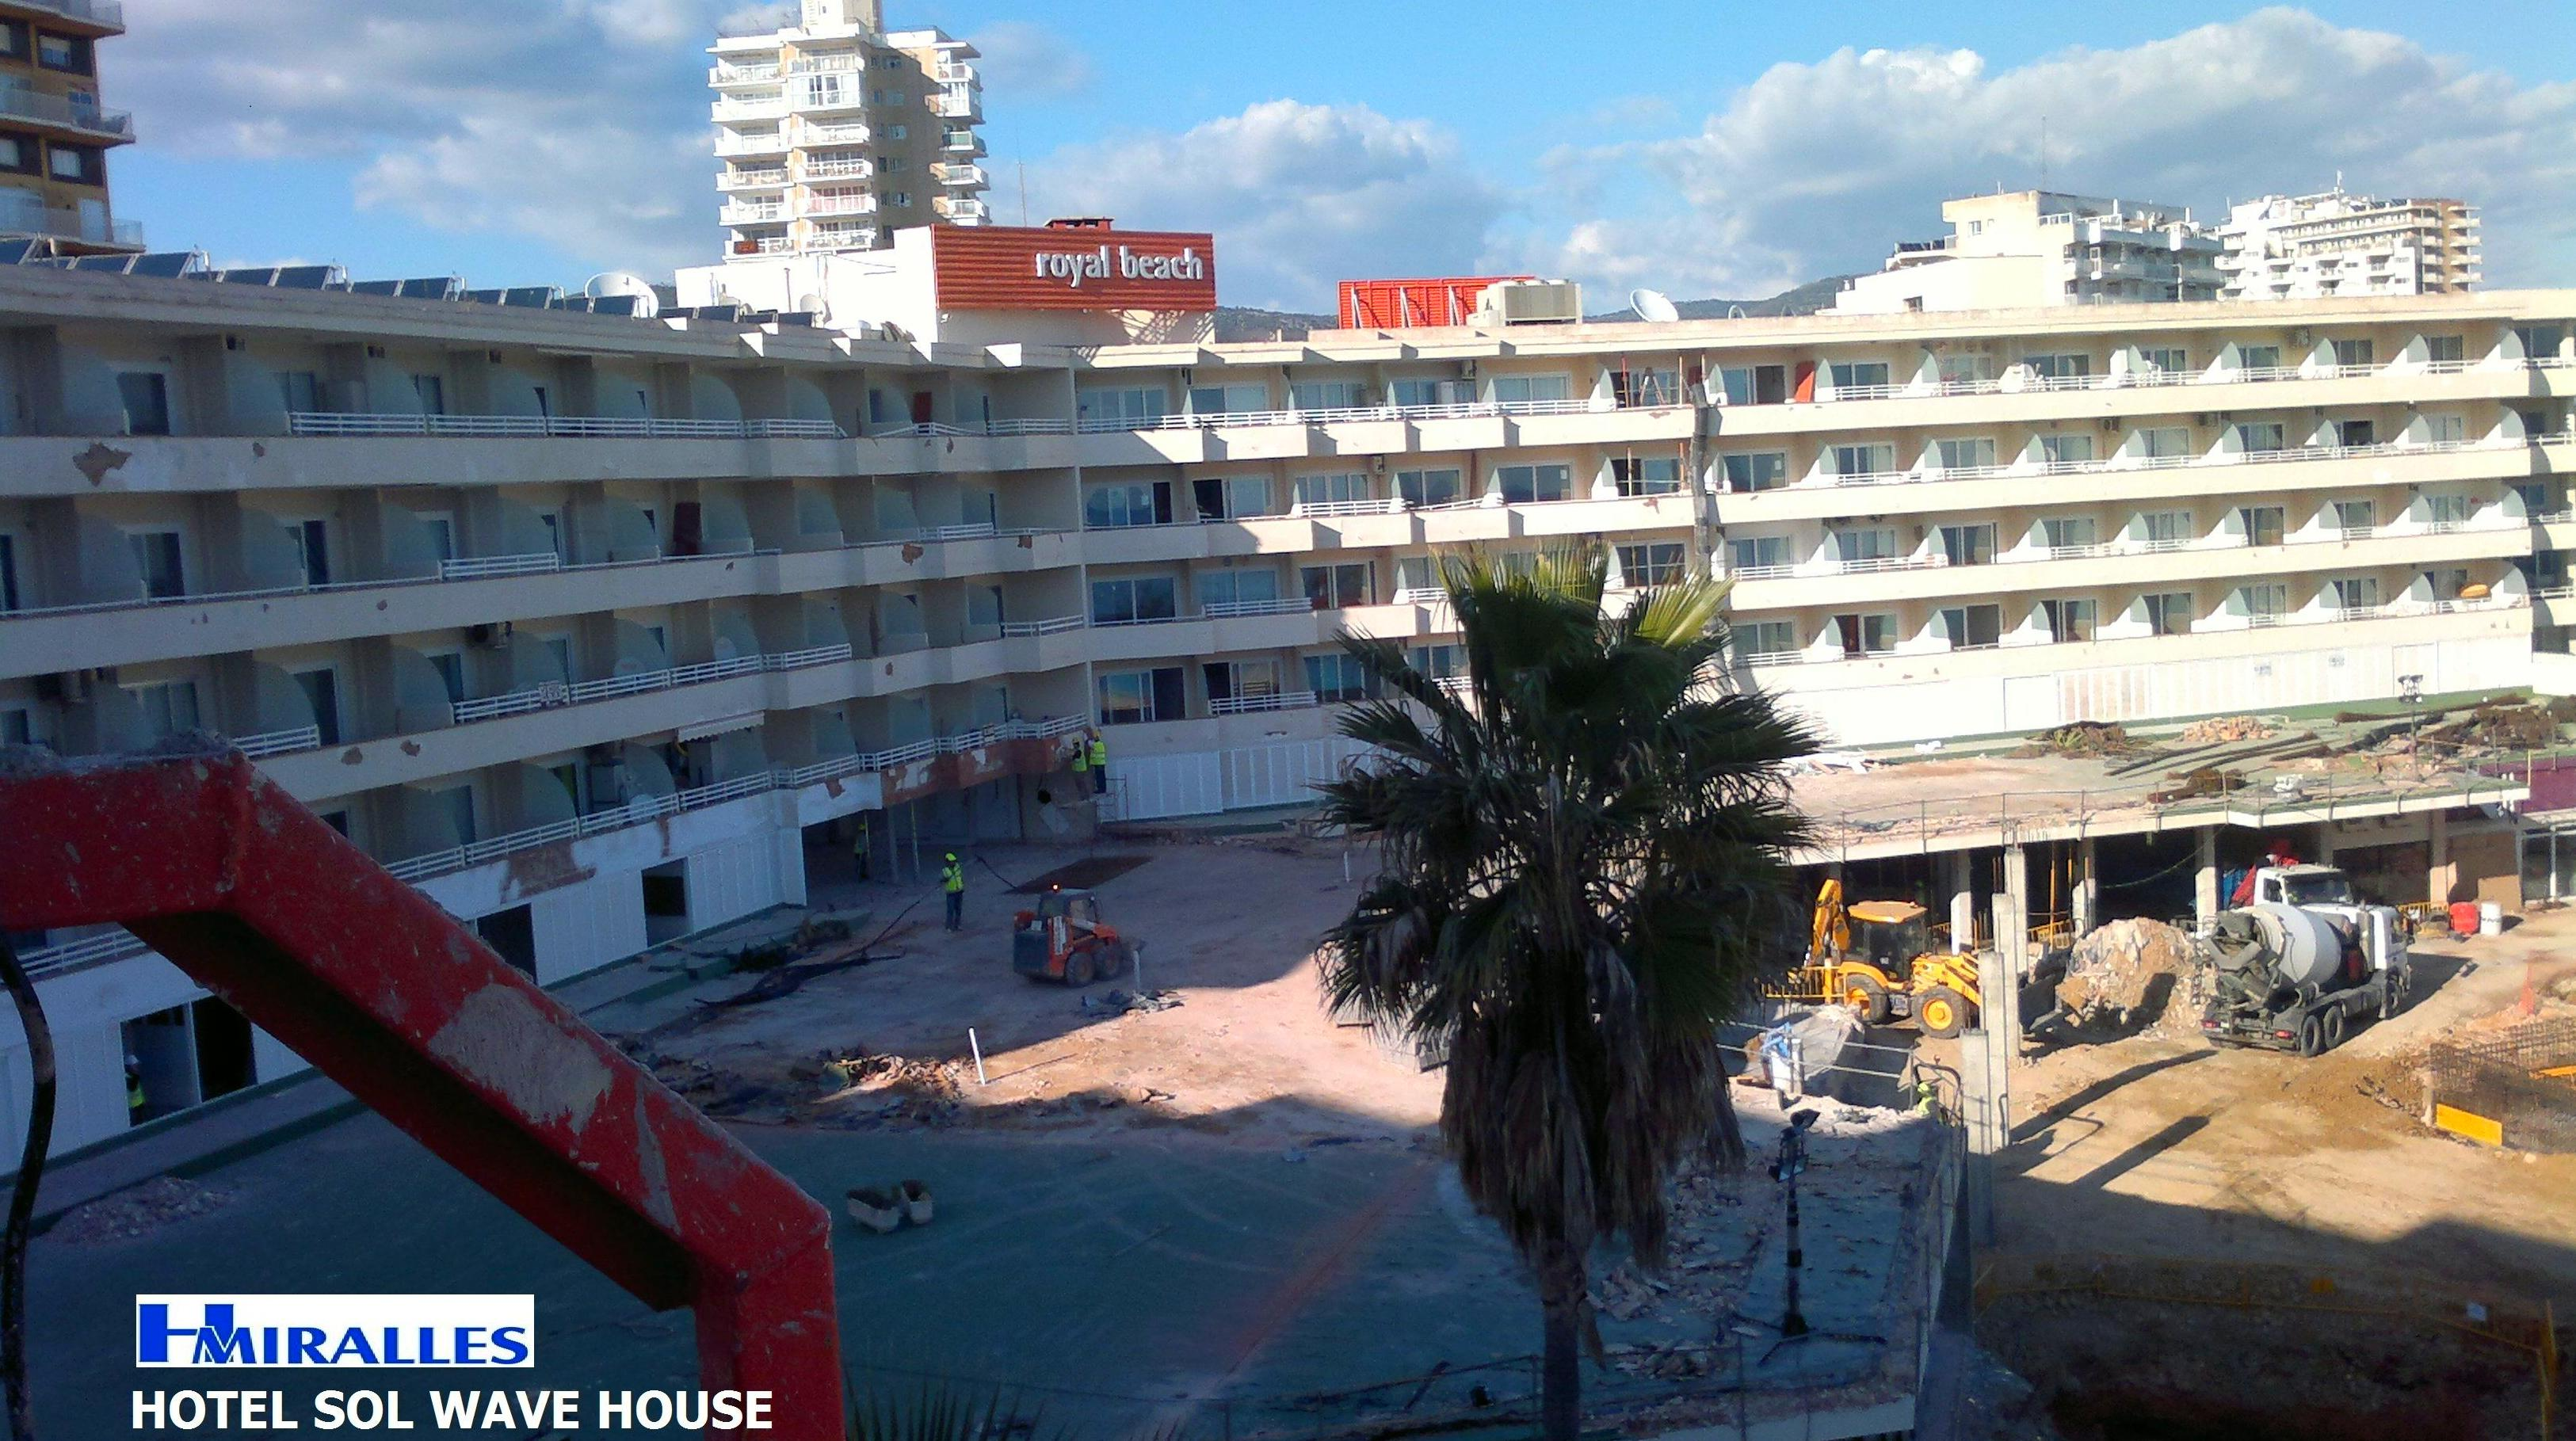 Foto 53 de Rehabilitación de edificios en Palma de Mallorca | Reformas y Pinturas Miralles